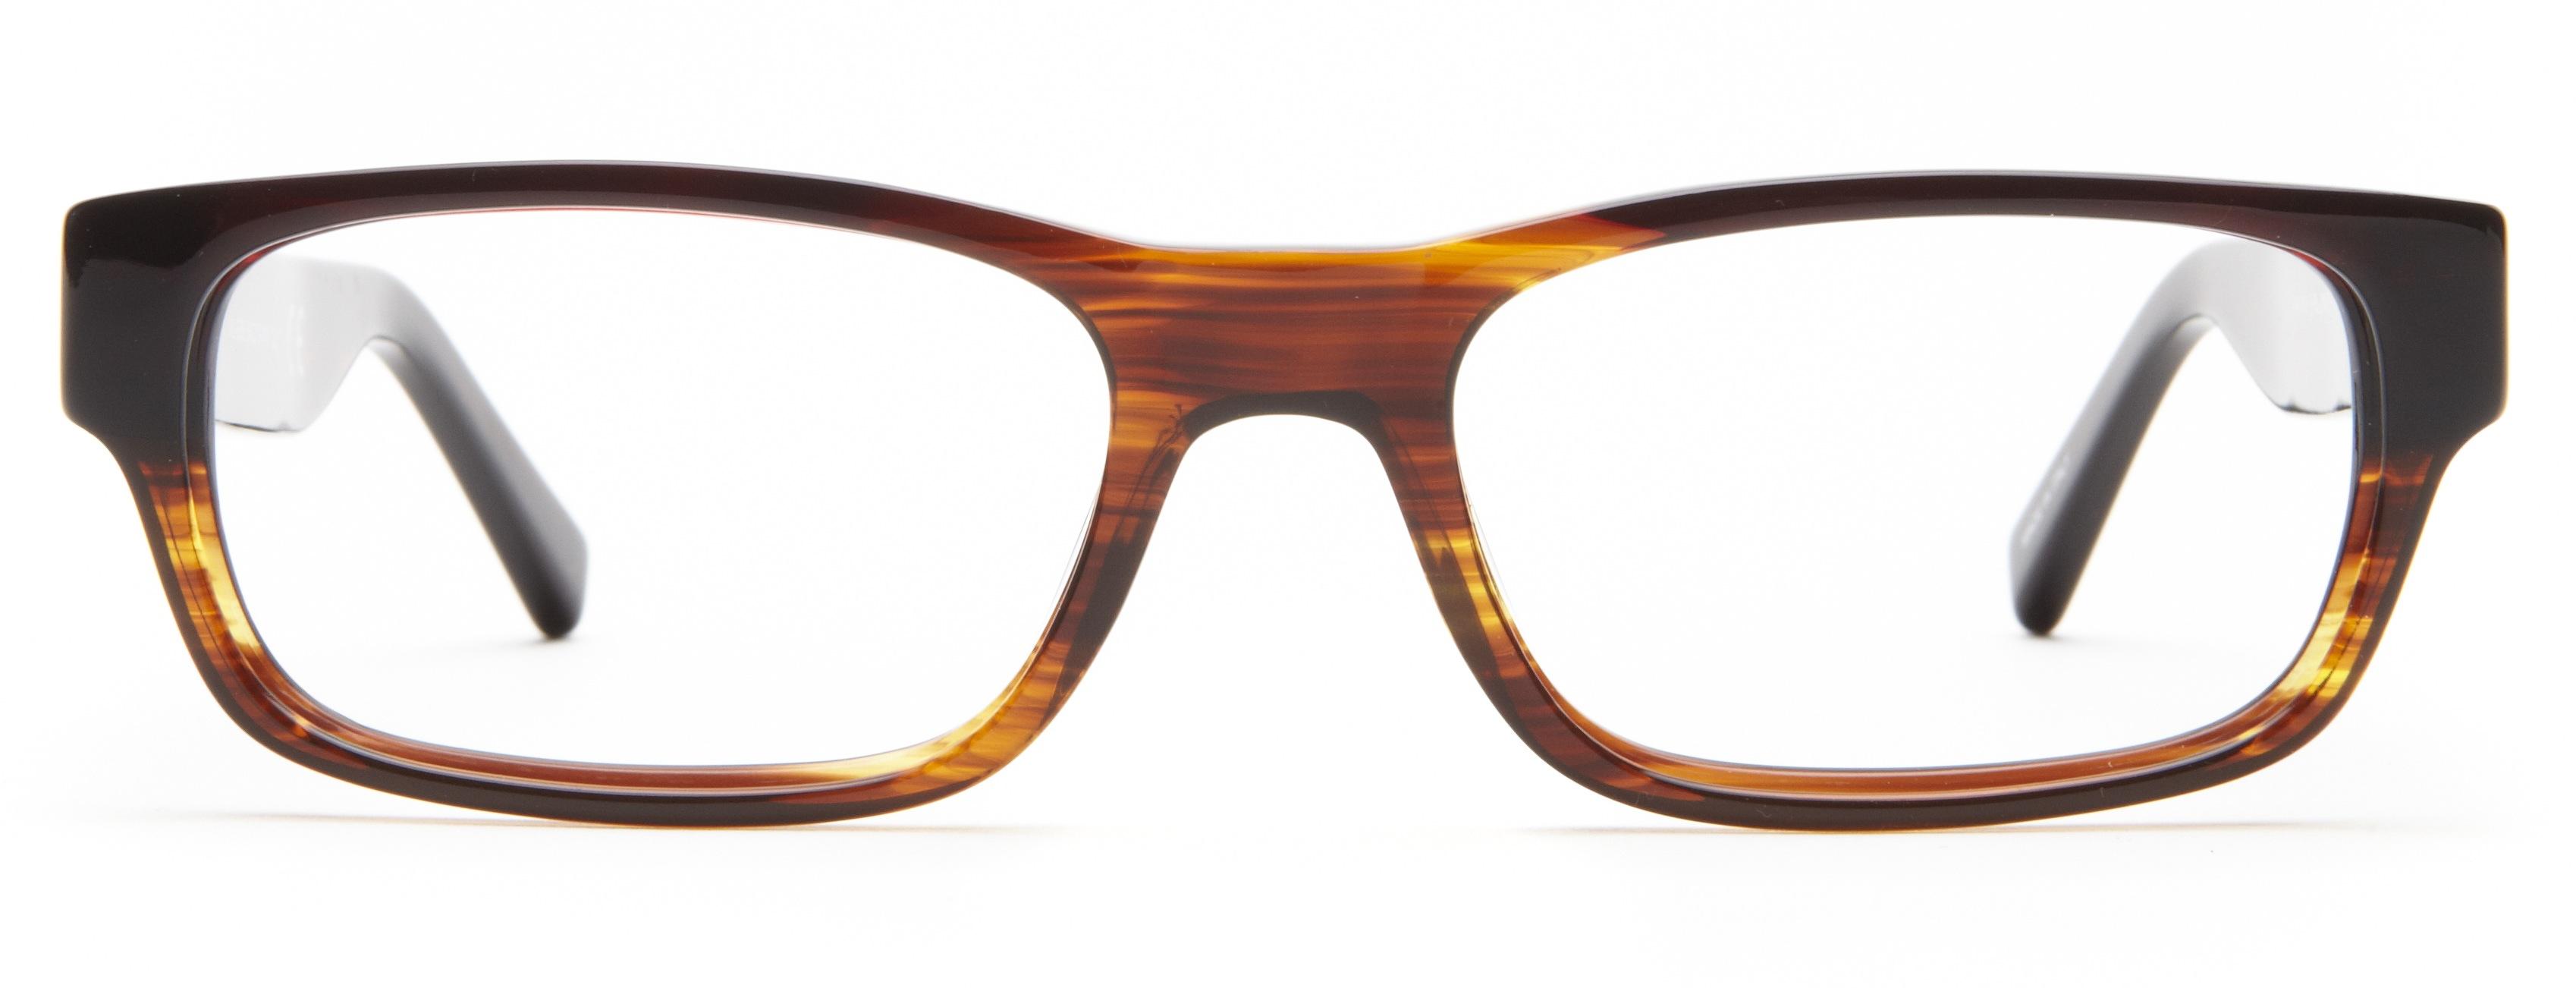 Tortoise & Blonde Dante Italian Eye Glasses | Dante Mens and Womens ...